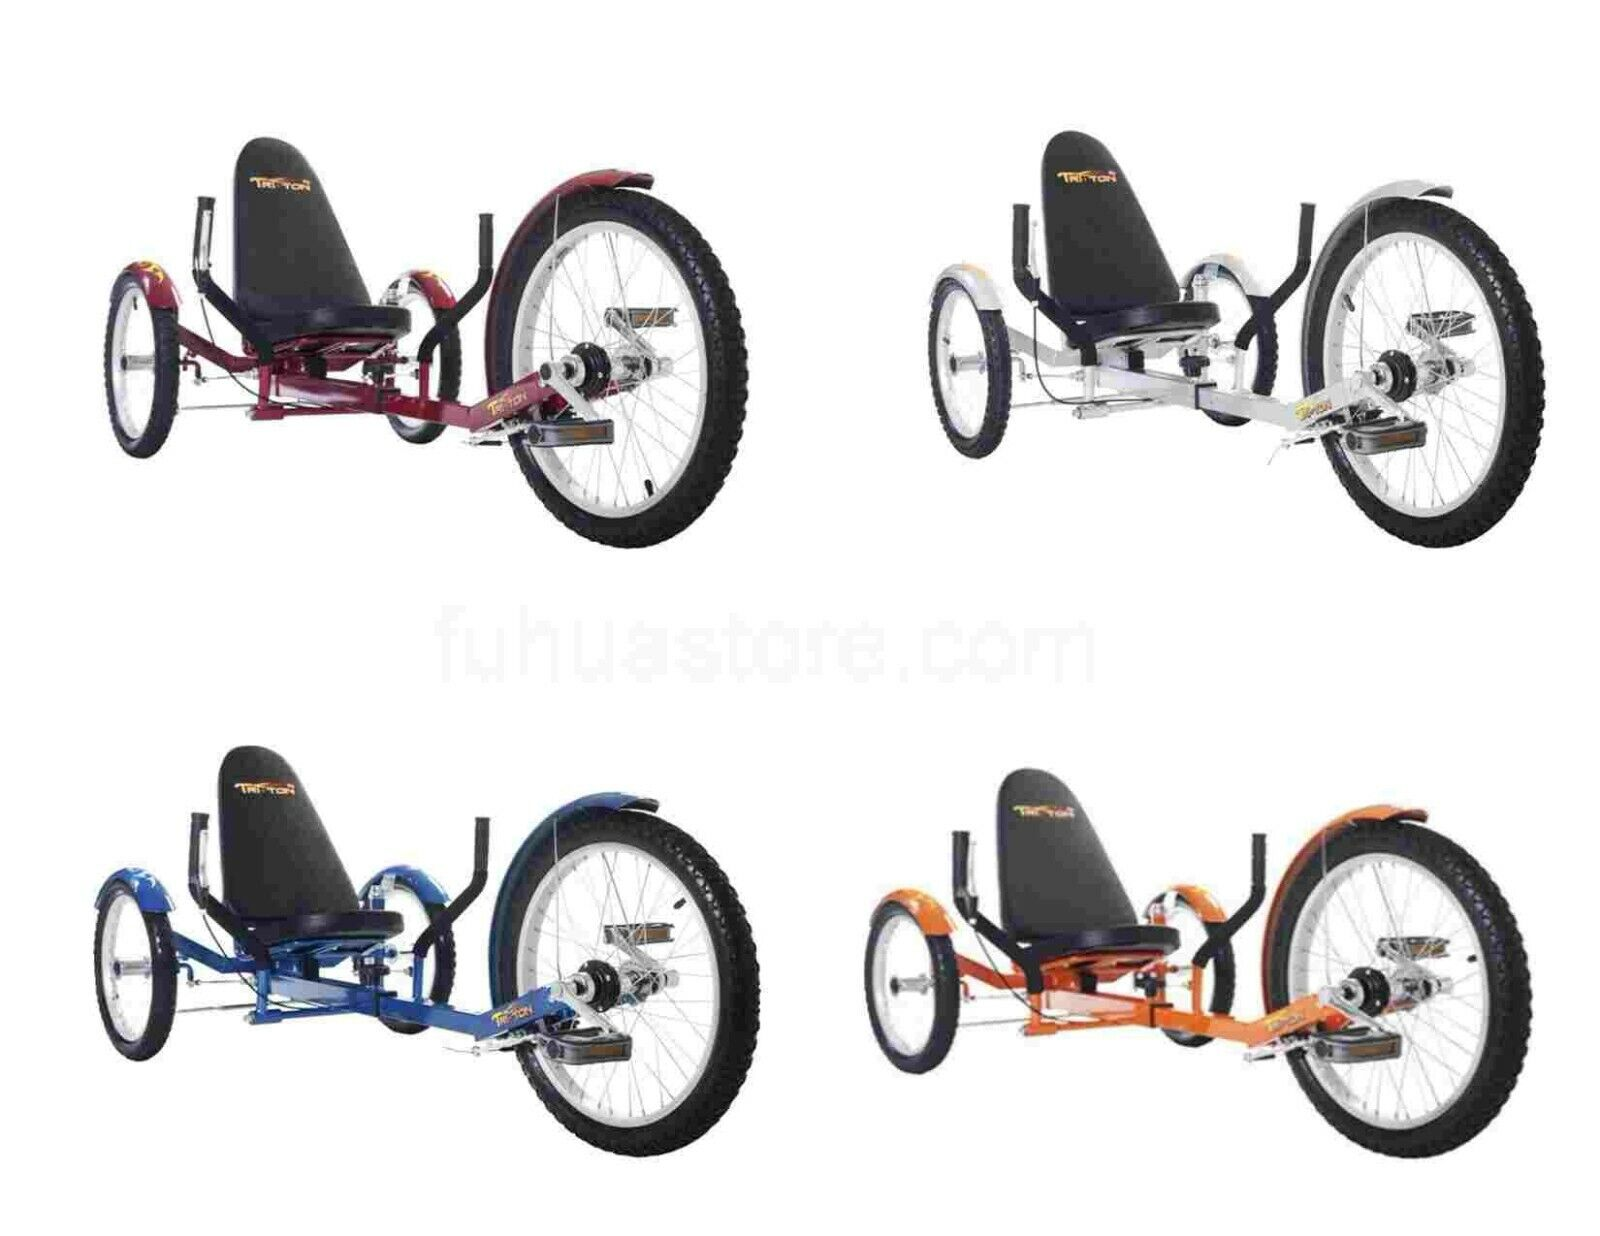 "Mobo TriTon Pro 20"" 3 WHEEL Tricycle RECUMBENT Trike Bike Co"